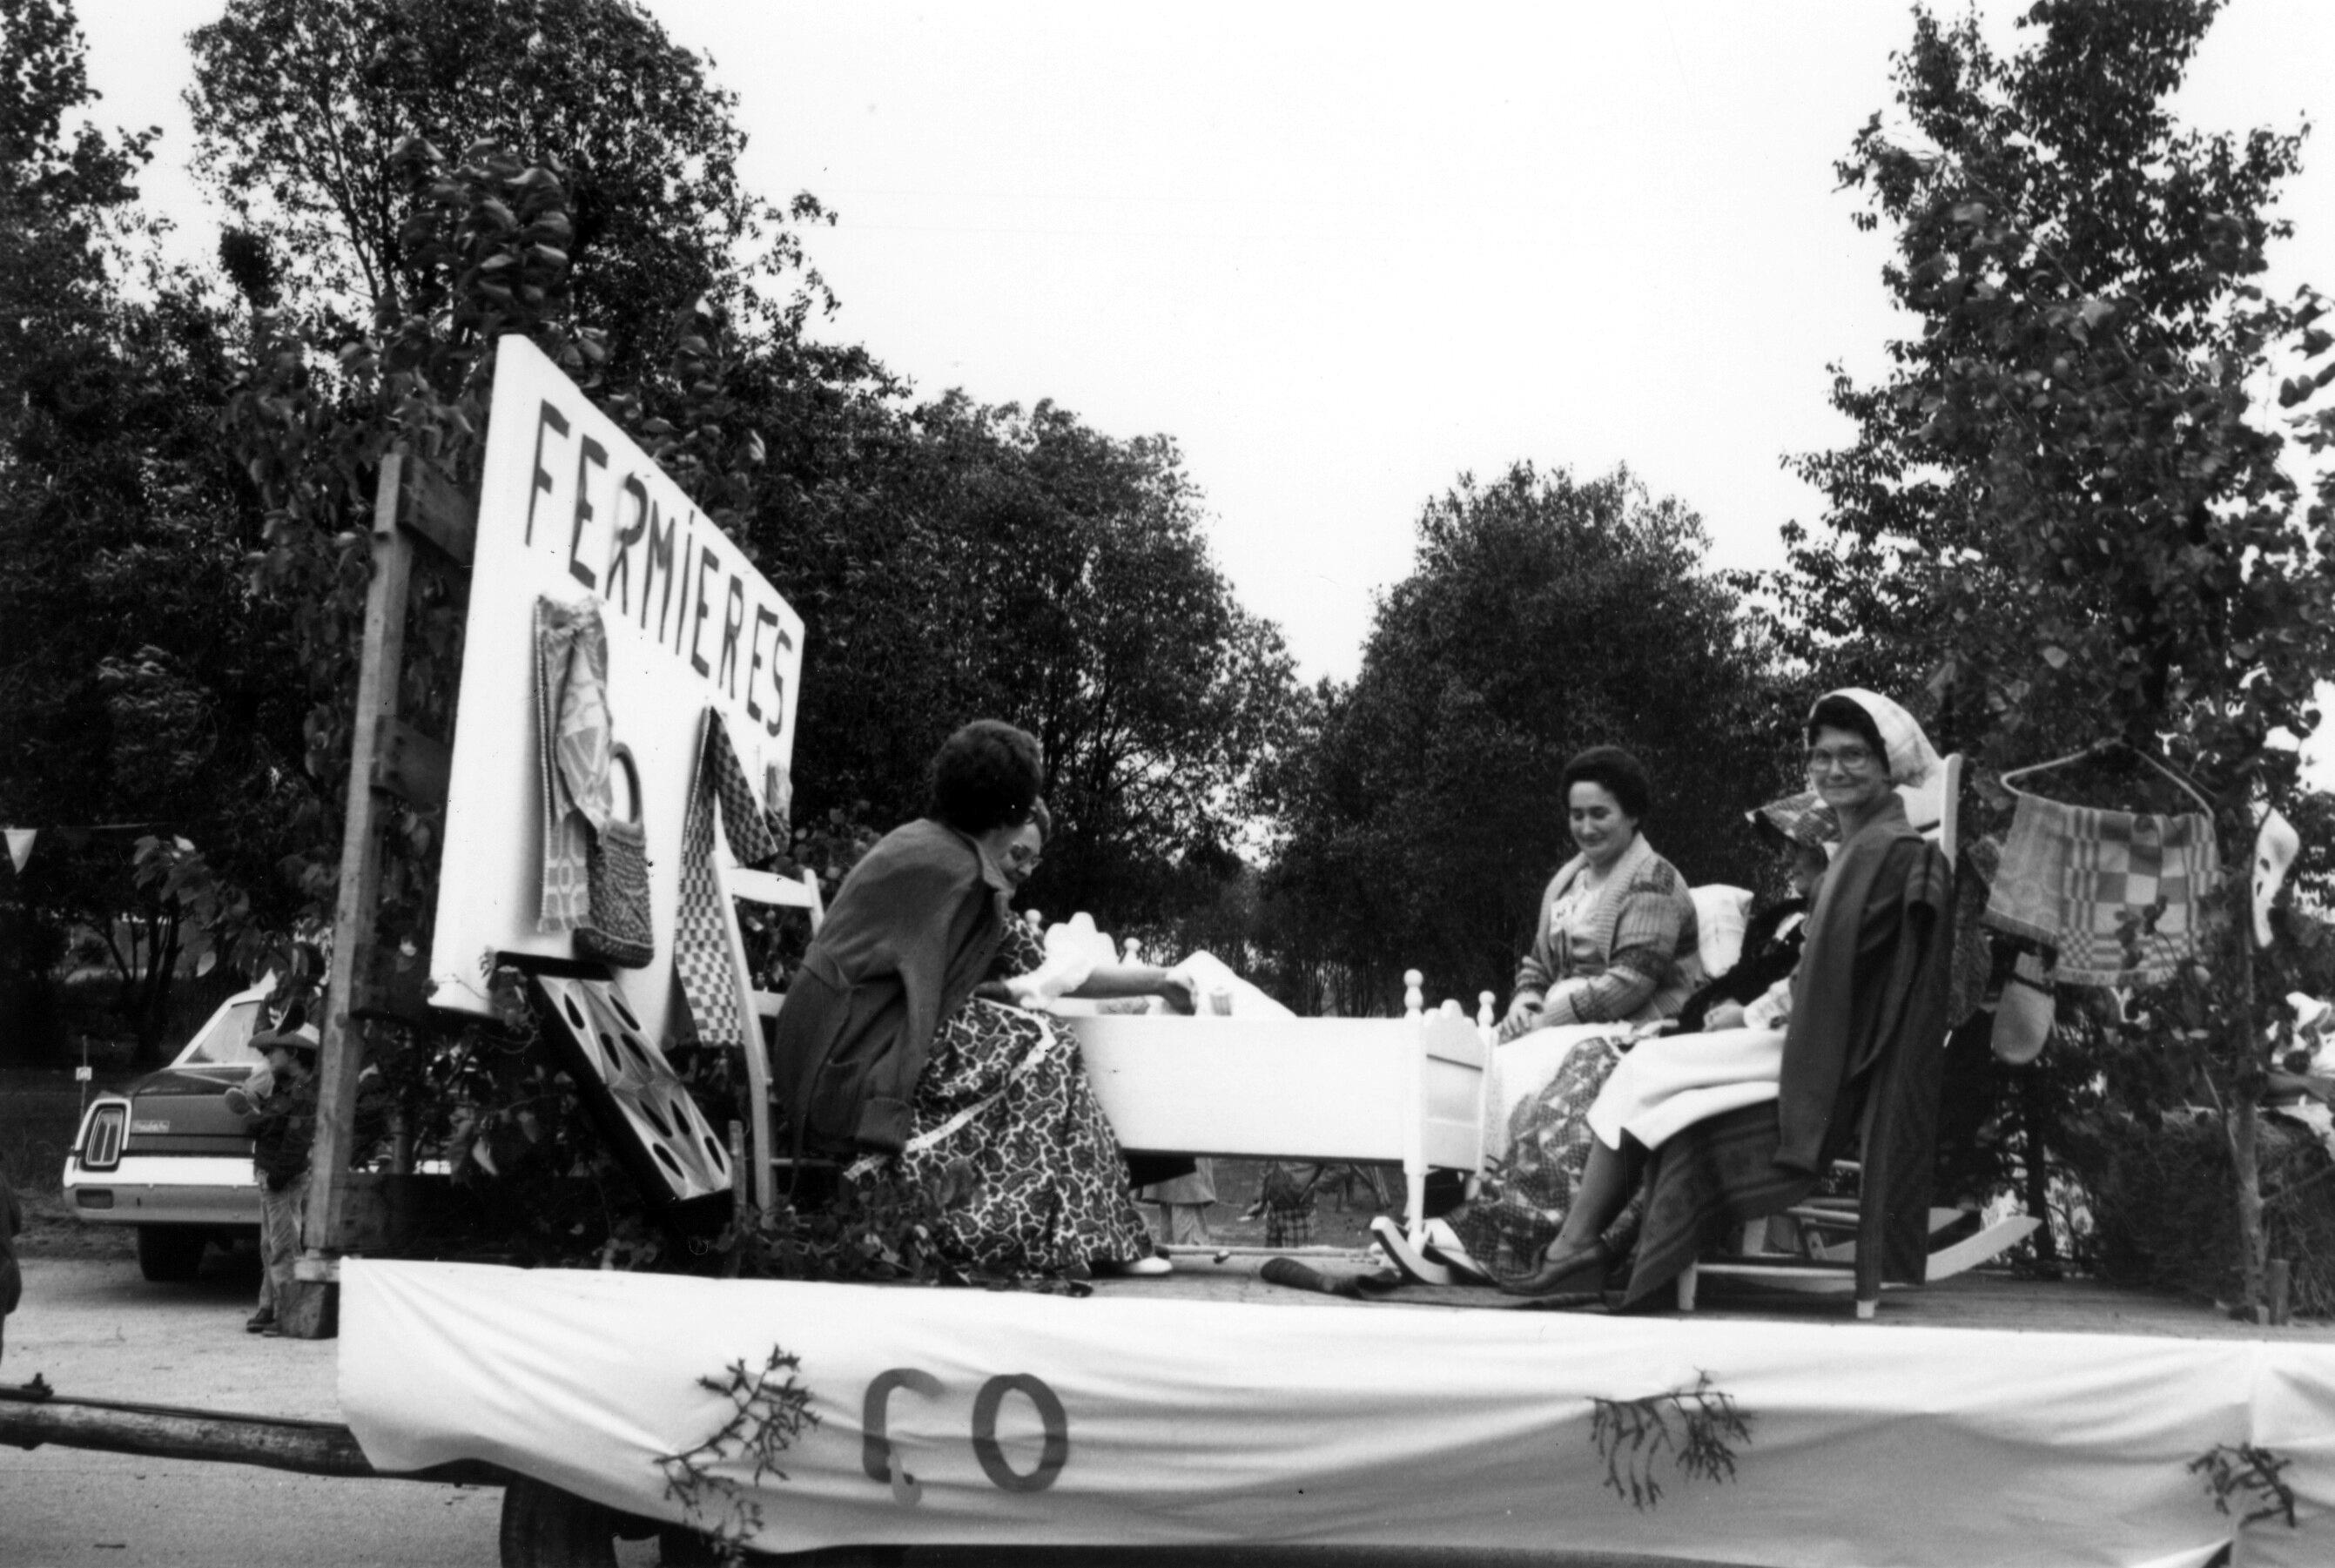 1977 - Char fermieres